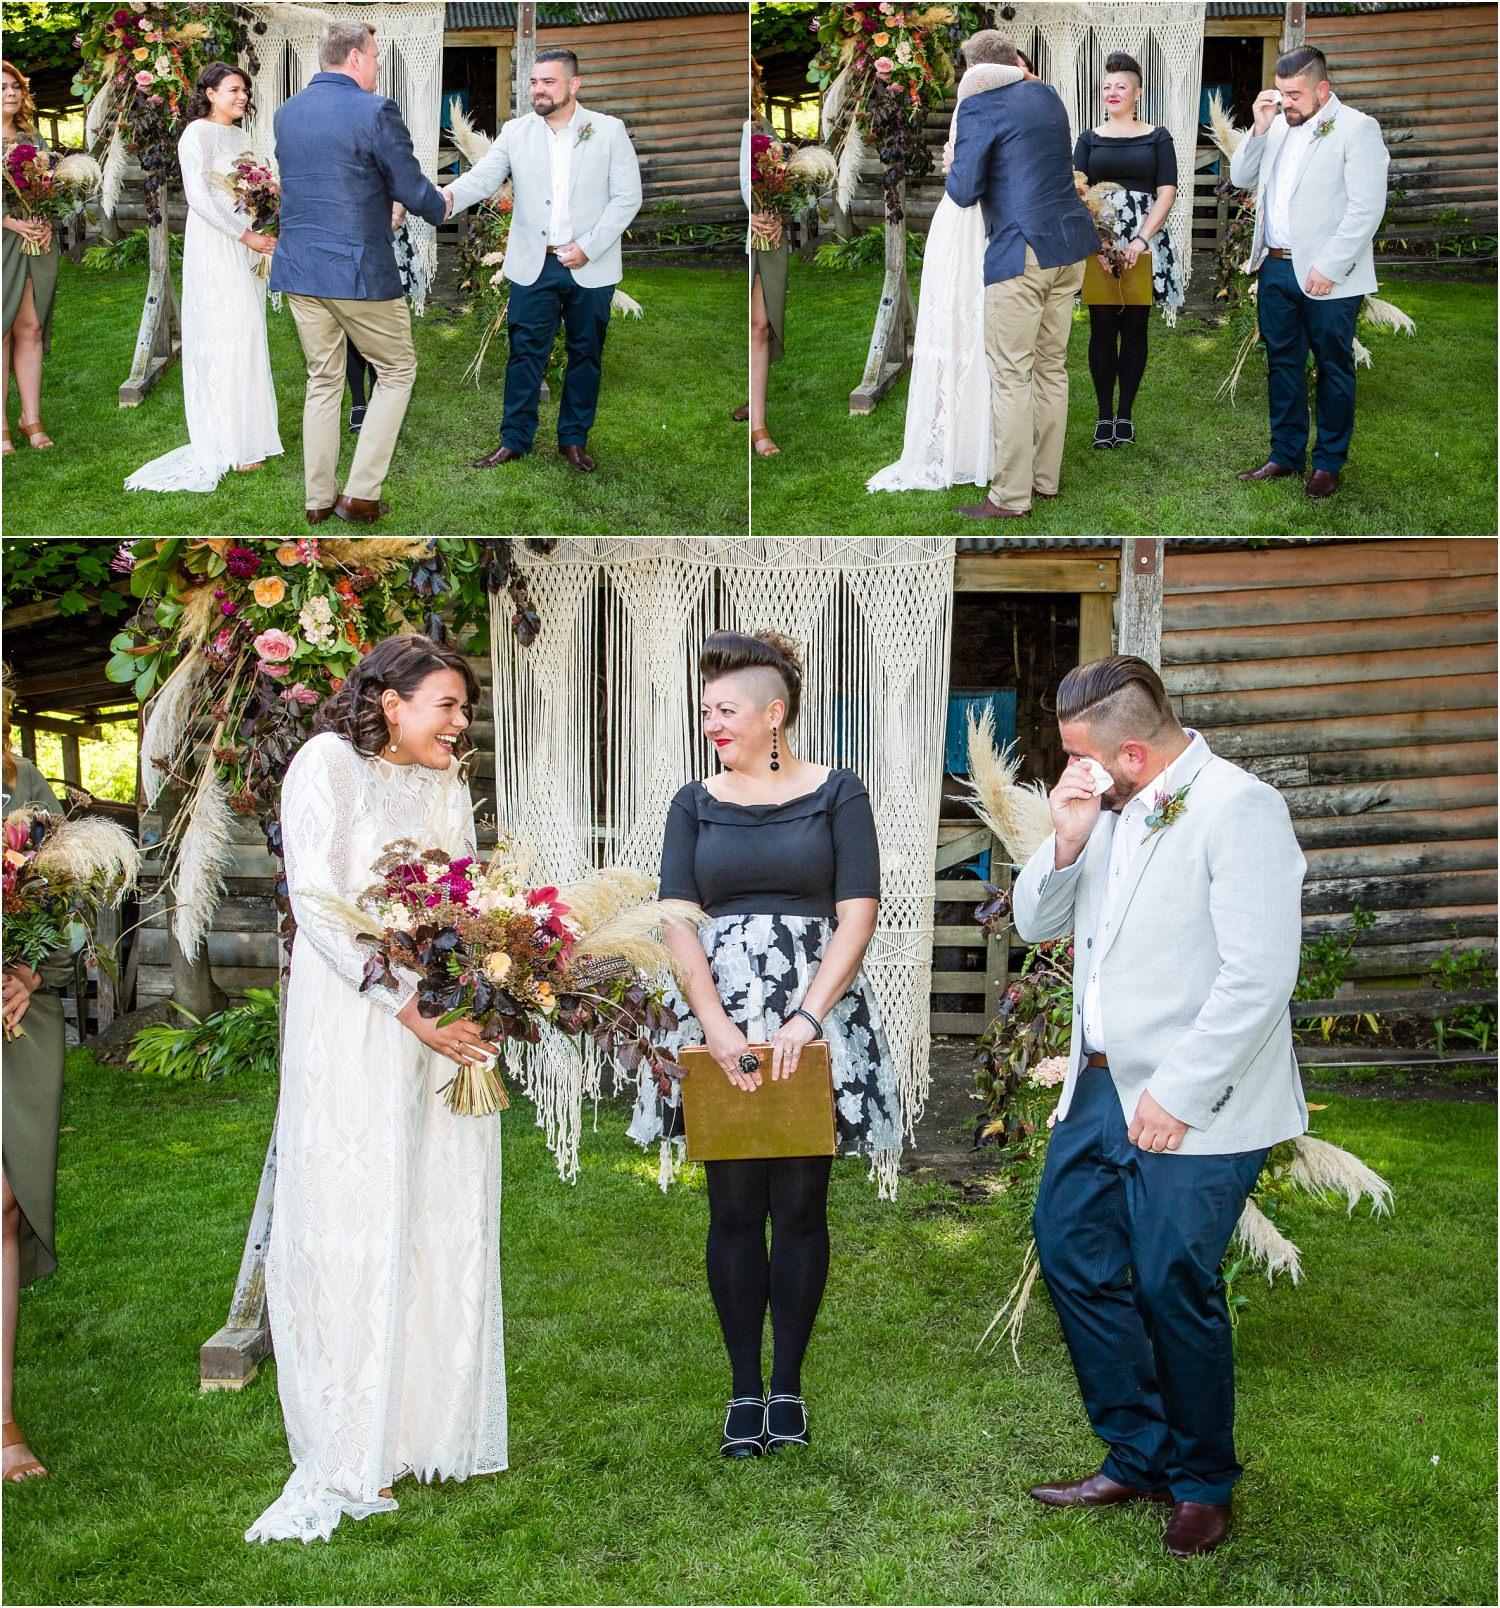 Wedding ceremony at Cardrona